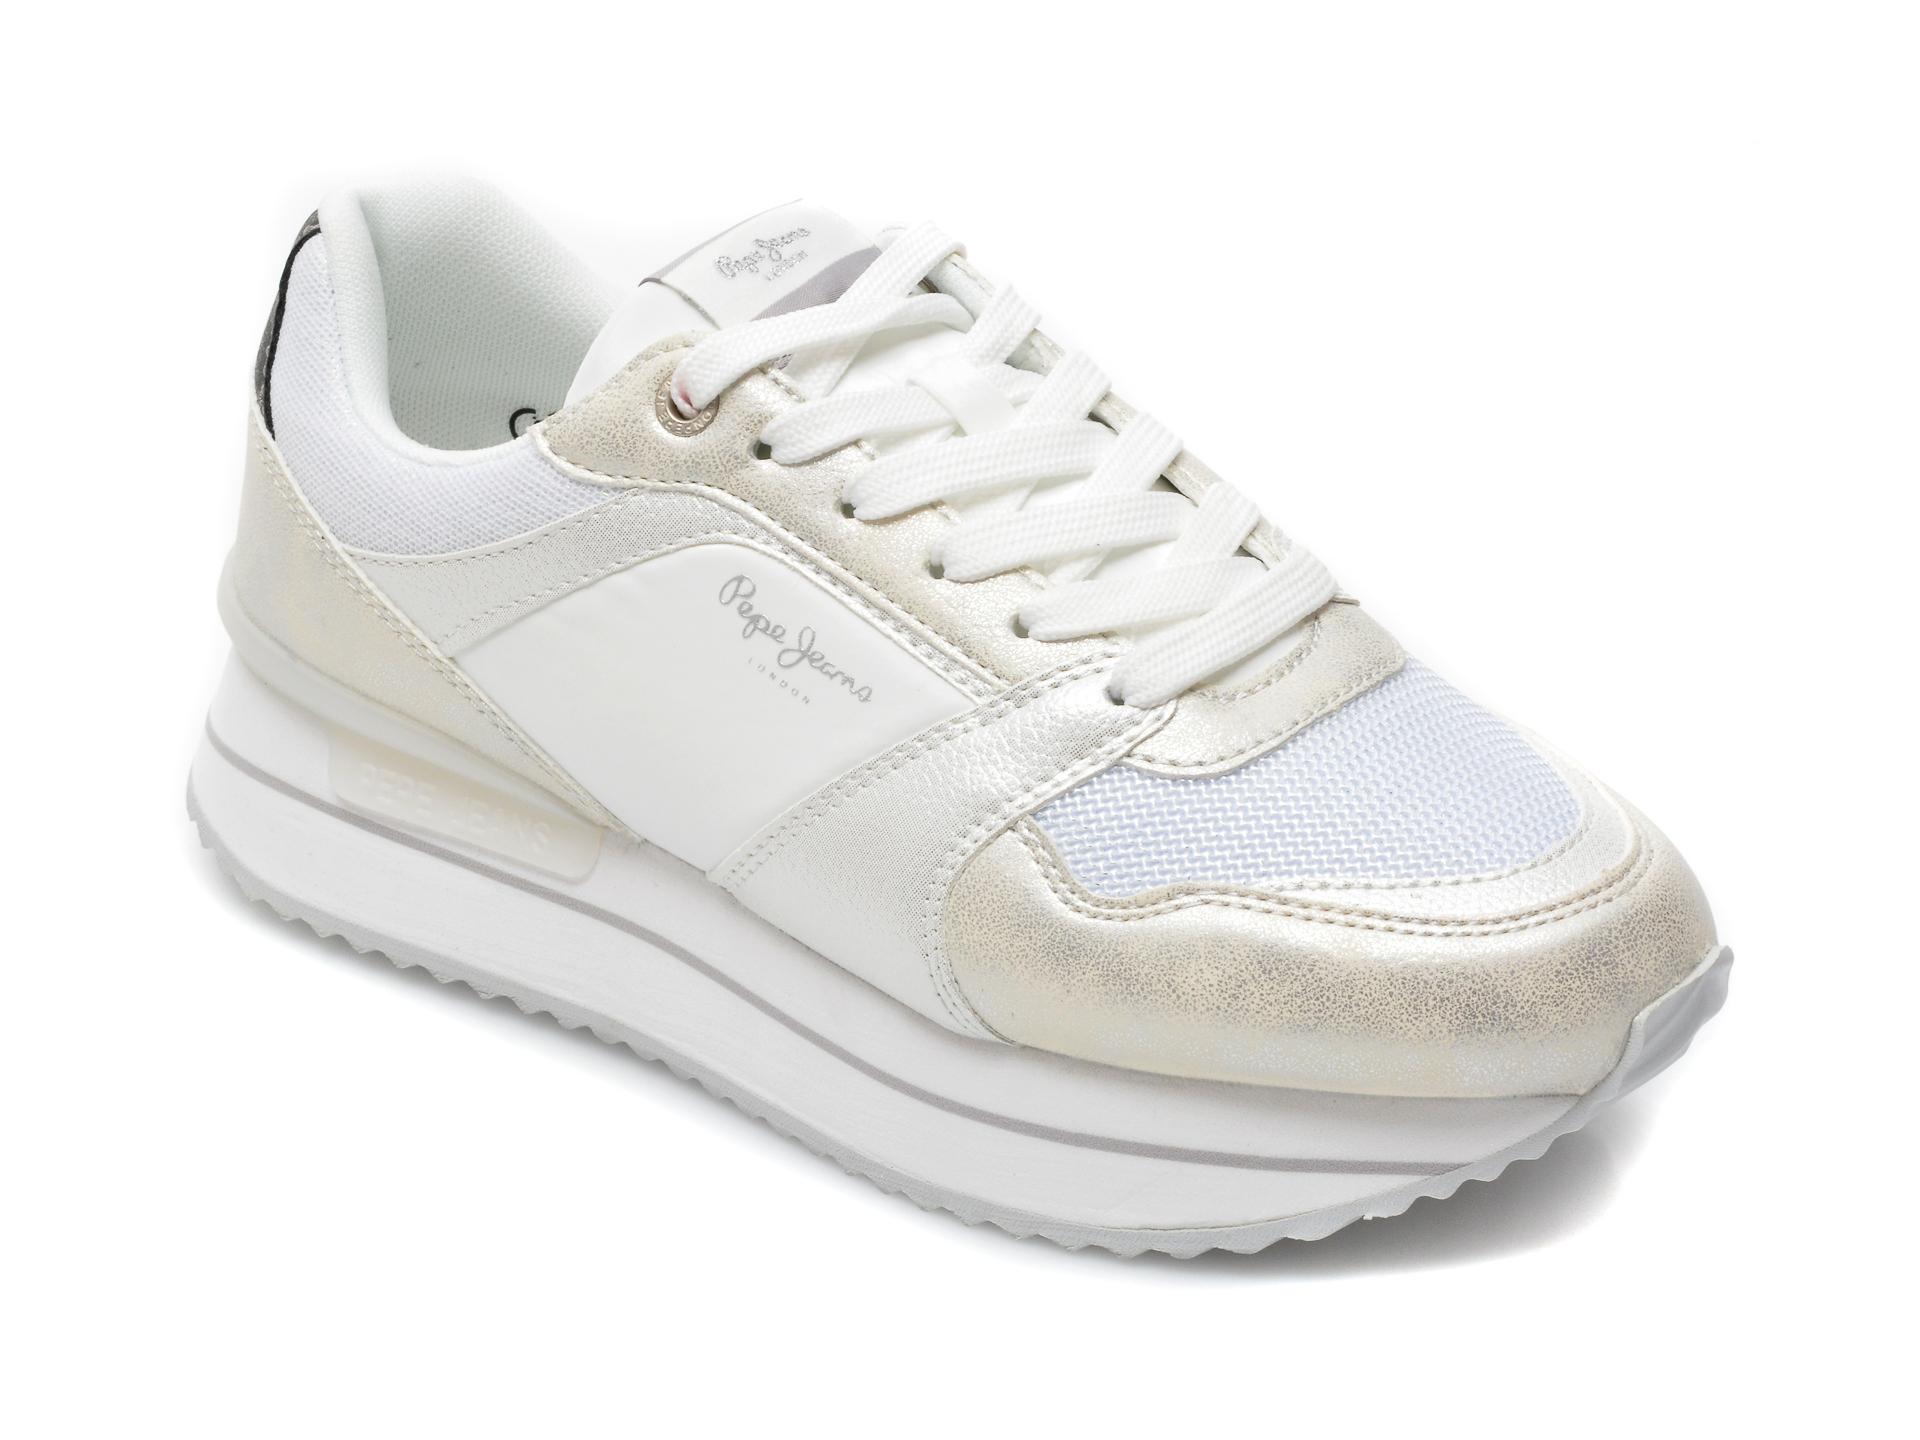 Pantofi Sport Pepe Jeans Argintii, 3118999, Din Material Textil Si Piele Naturala